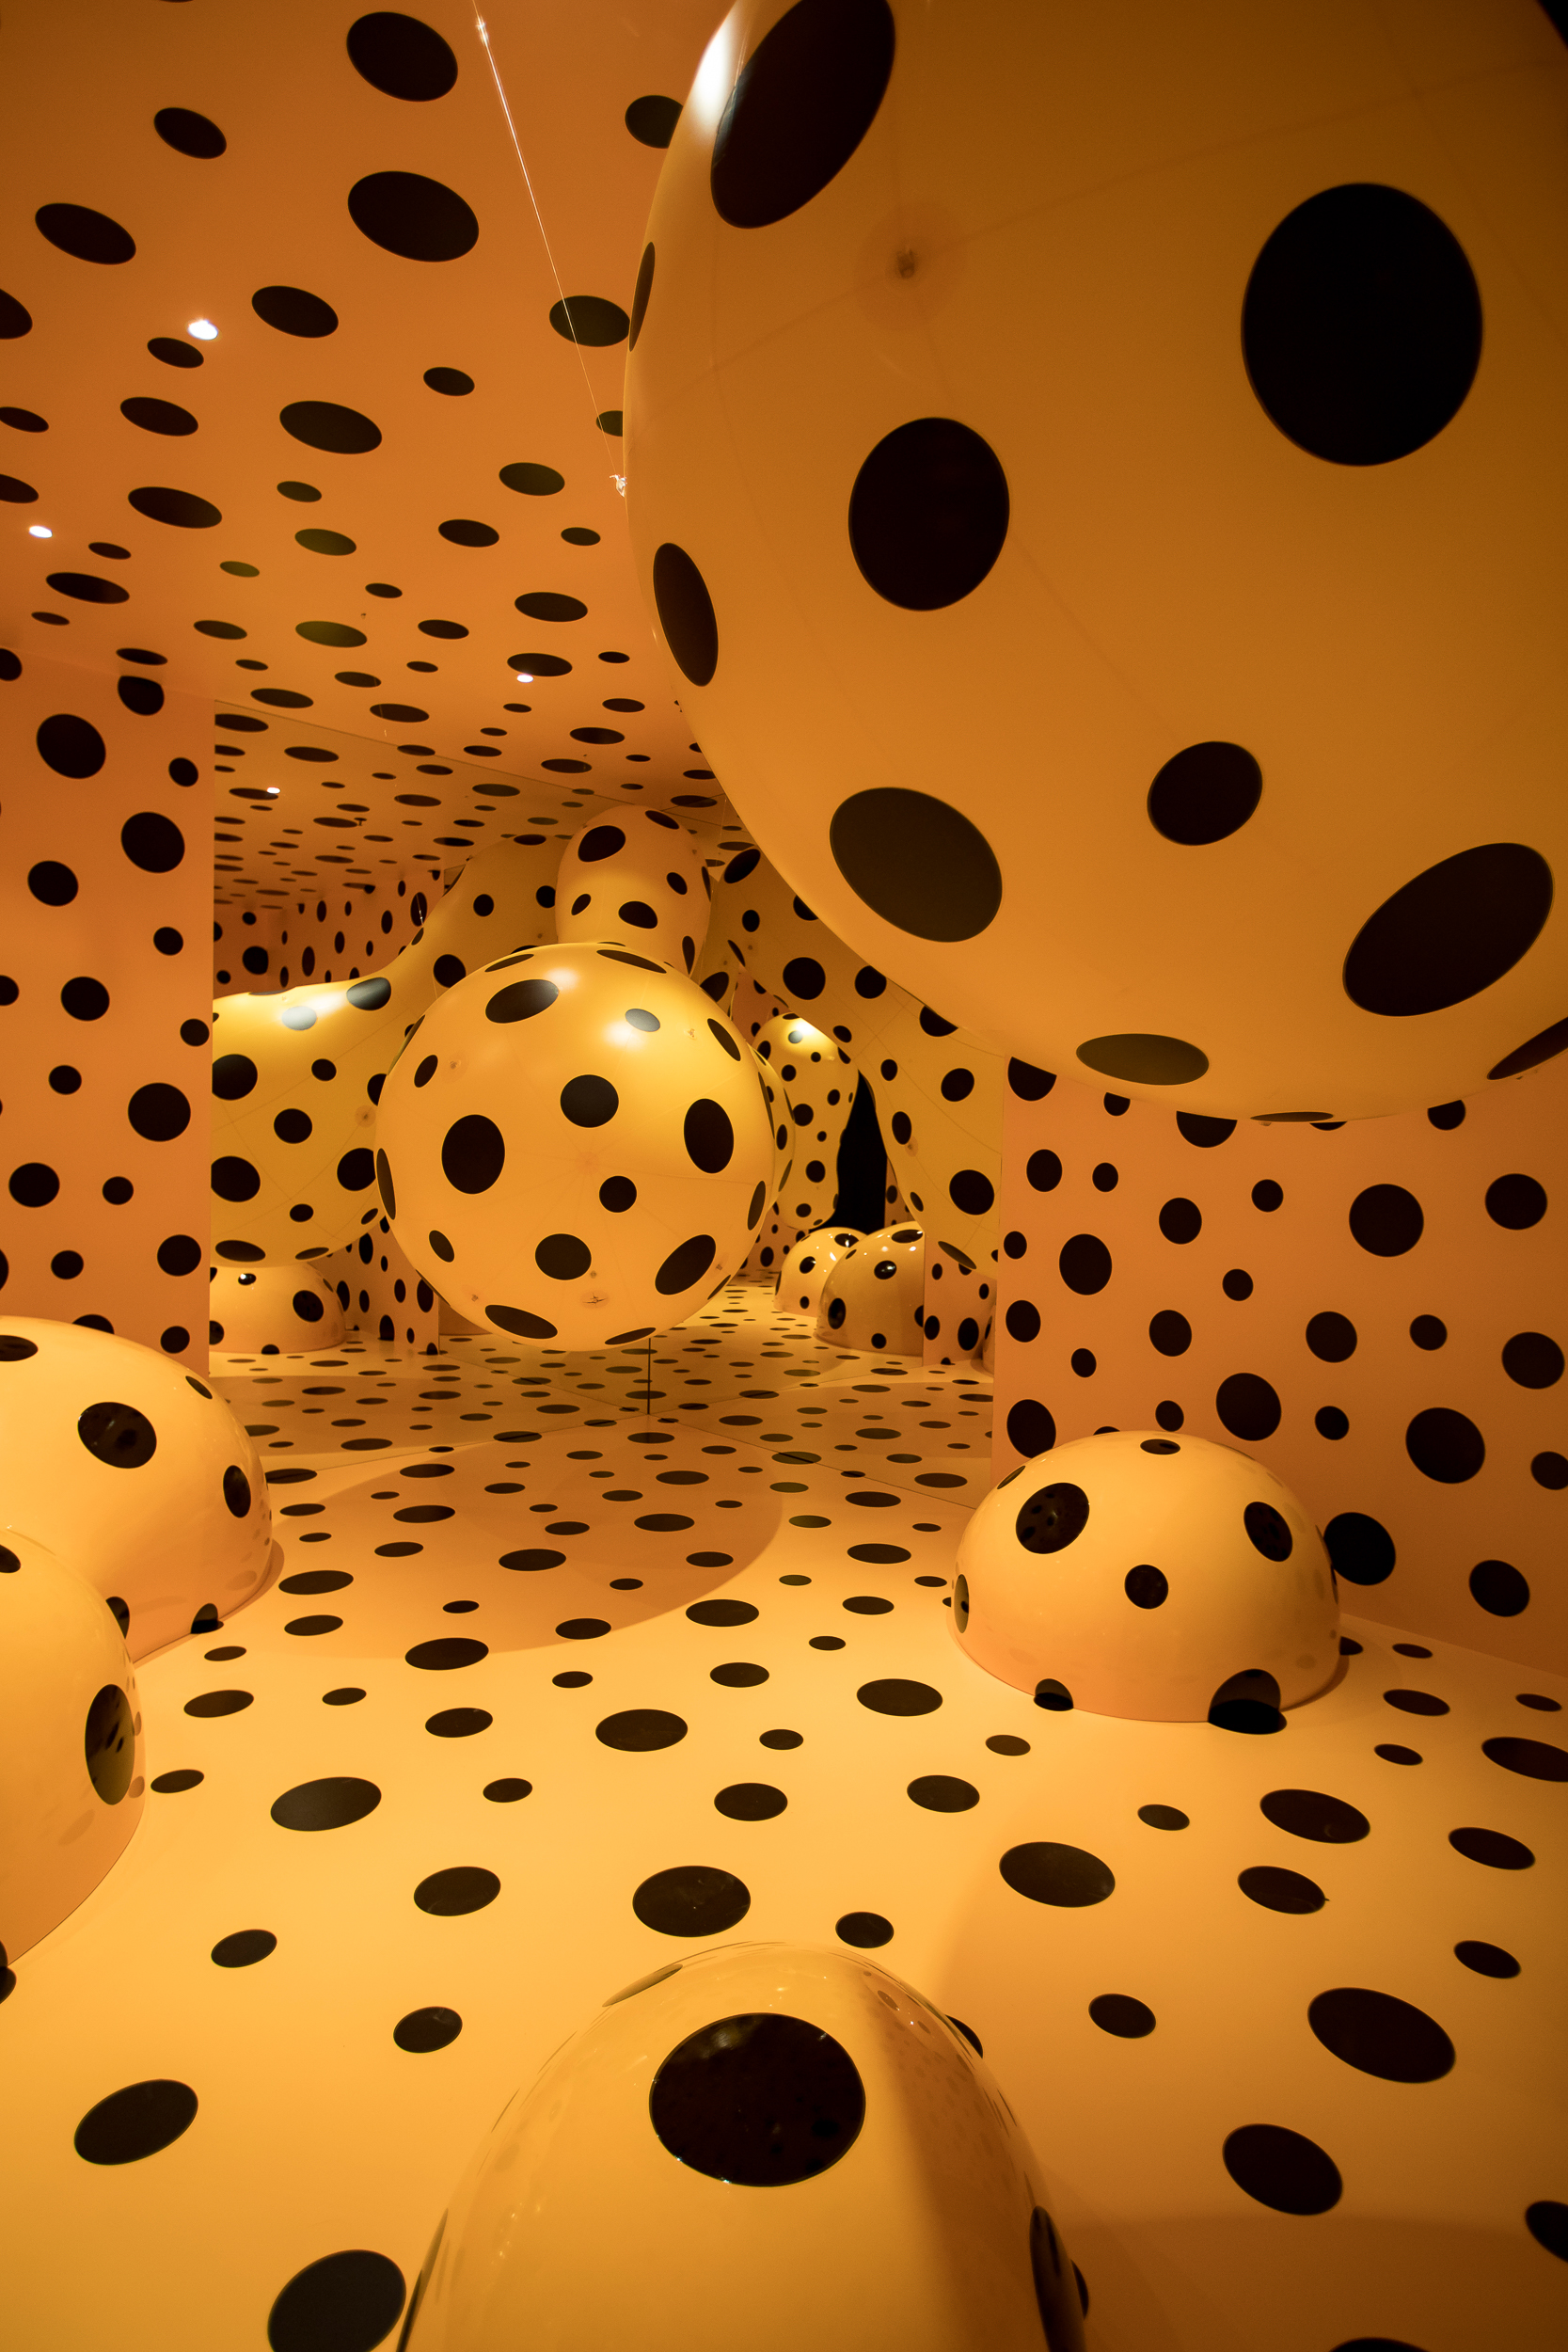 Dots Obsession—Tasmania 2016  Yayoi Kusama (Born 1929, Matsumoto, Japan; lives and works in Tokyo, Japan) Mixed media installation Commissioned by Mona for On the Origin of Art  ©Yayoi Kusama. Courtesy YAYOI KUSAMA Inc., Ota Fine Arts, Tokyo/ Singapore and Victoria Miro Gallery, London